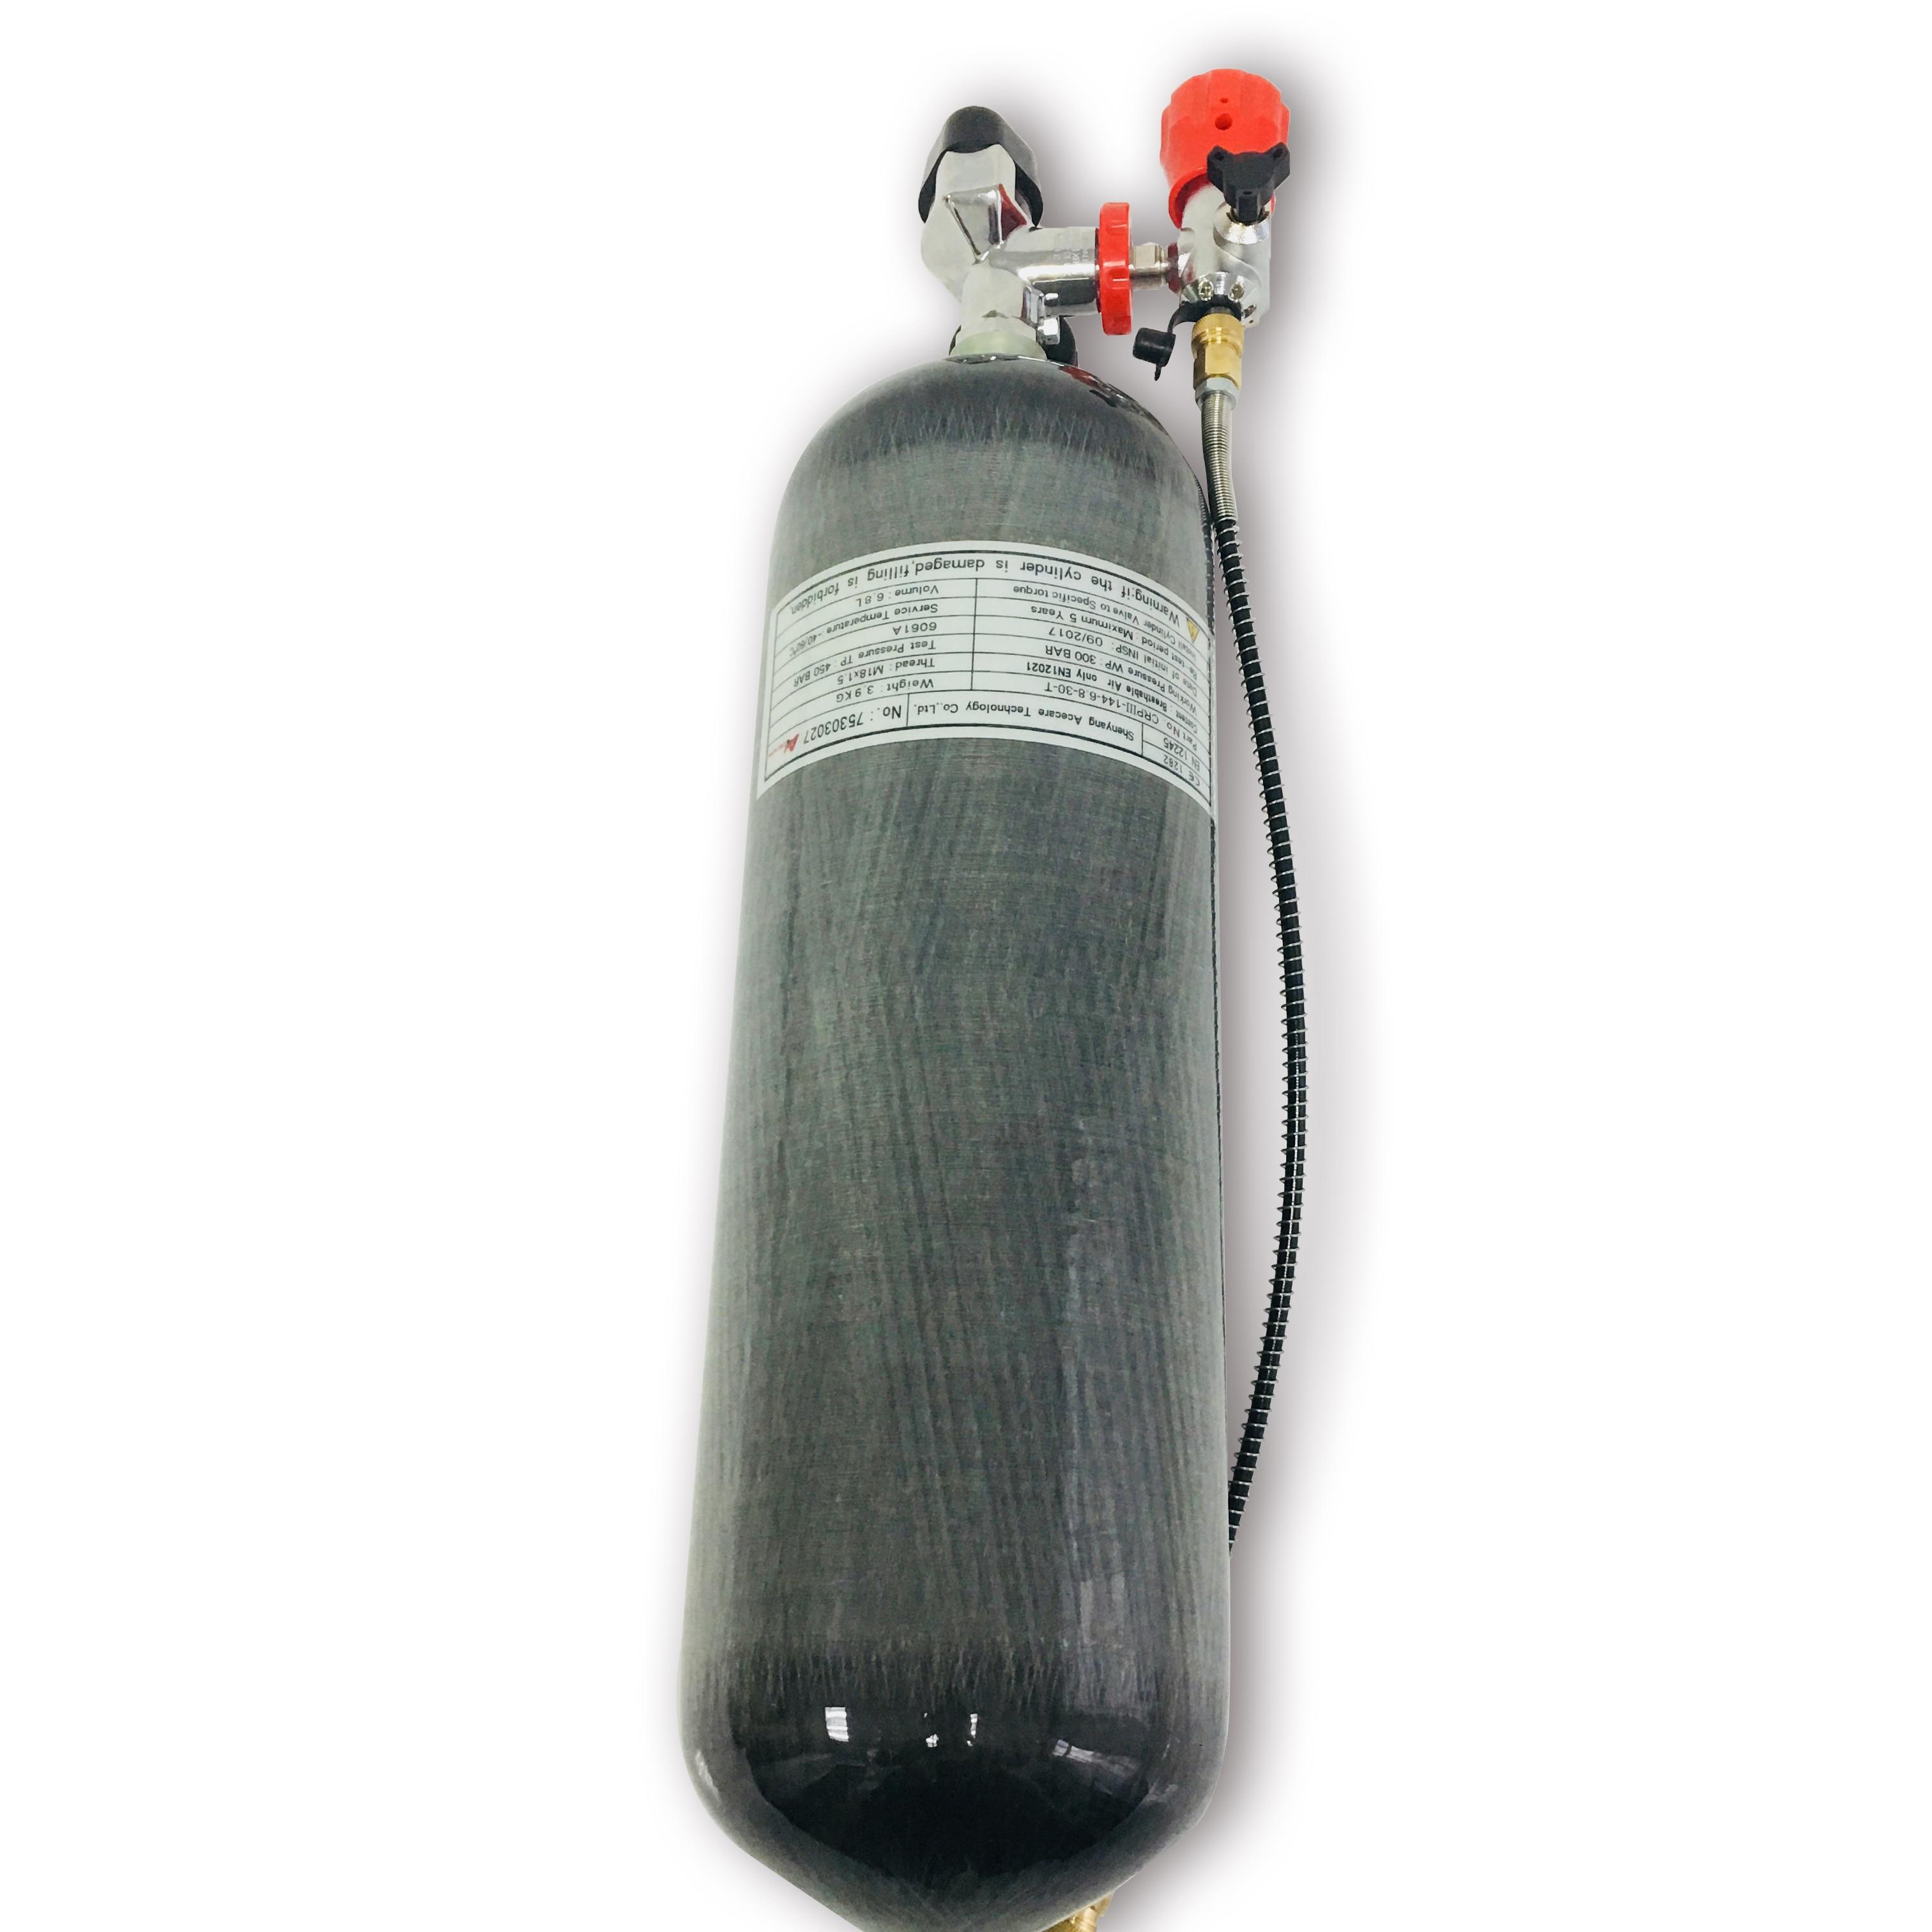 Ac268101 Carbon Fiber High Pressure Gas Cylinder 4500Psi /300Bar 6.8L Gun Air Tank Compressed Airforce Condor Scuba Pcp Acecare